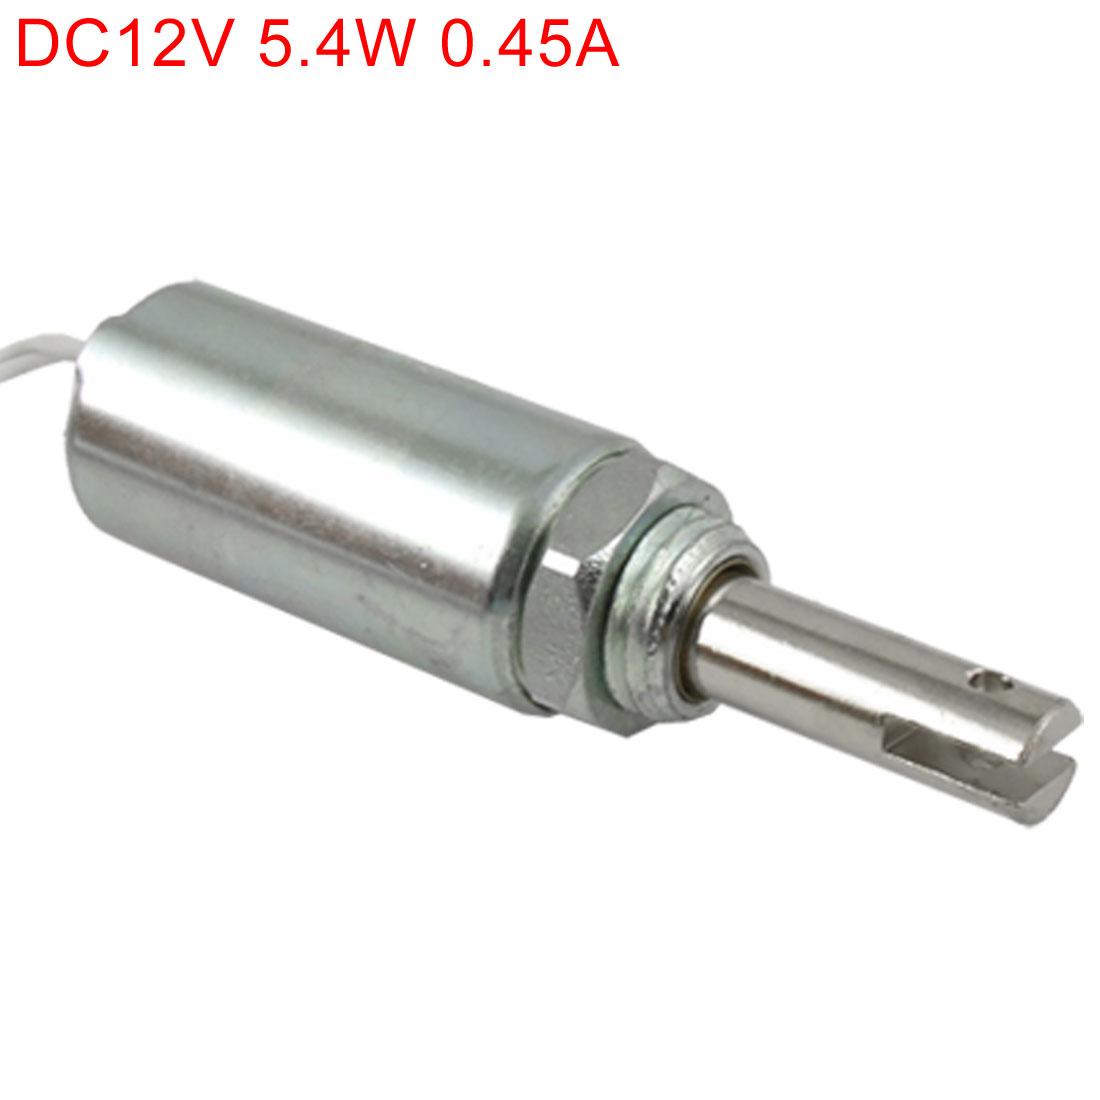 DC 12V 0.45A 10mm Stroke Pull Type Tubular Solenoid Electromagnet